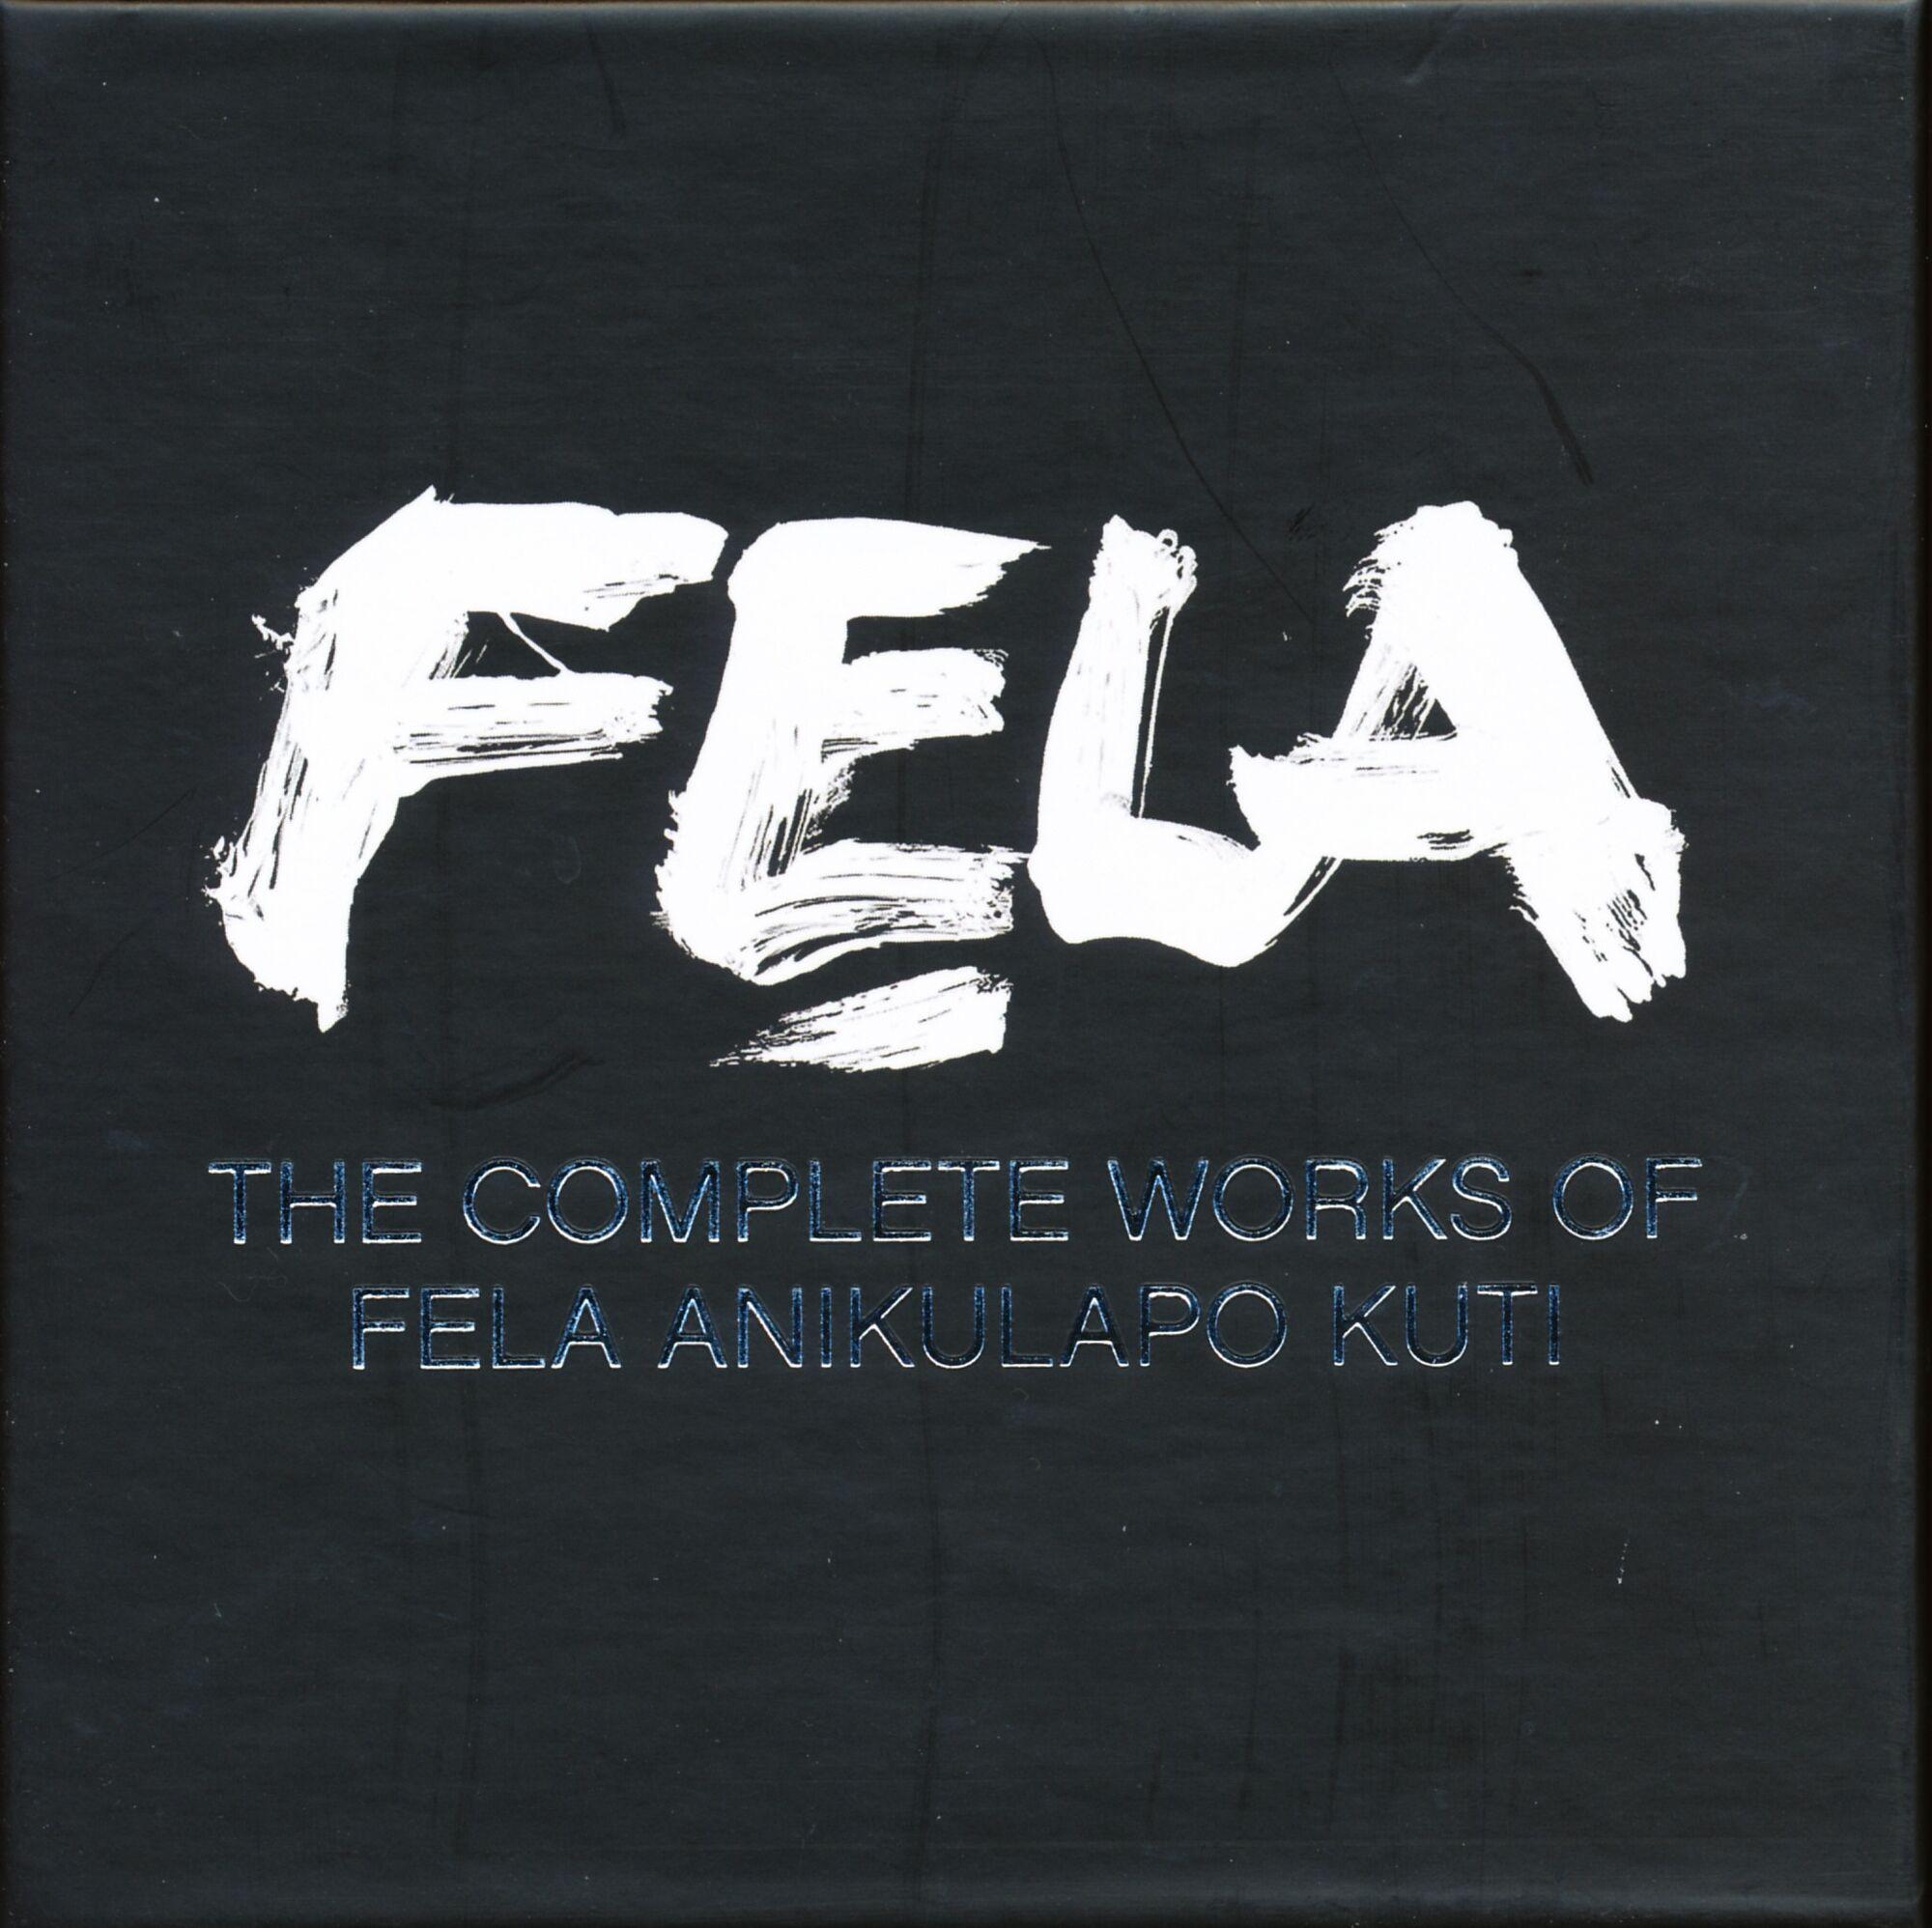 Fela Kuti Jama Rico Fandom Powered By Wikia